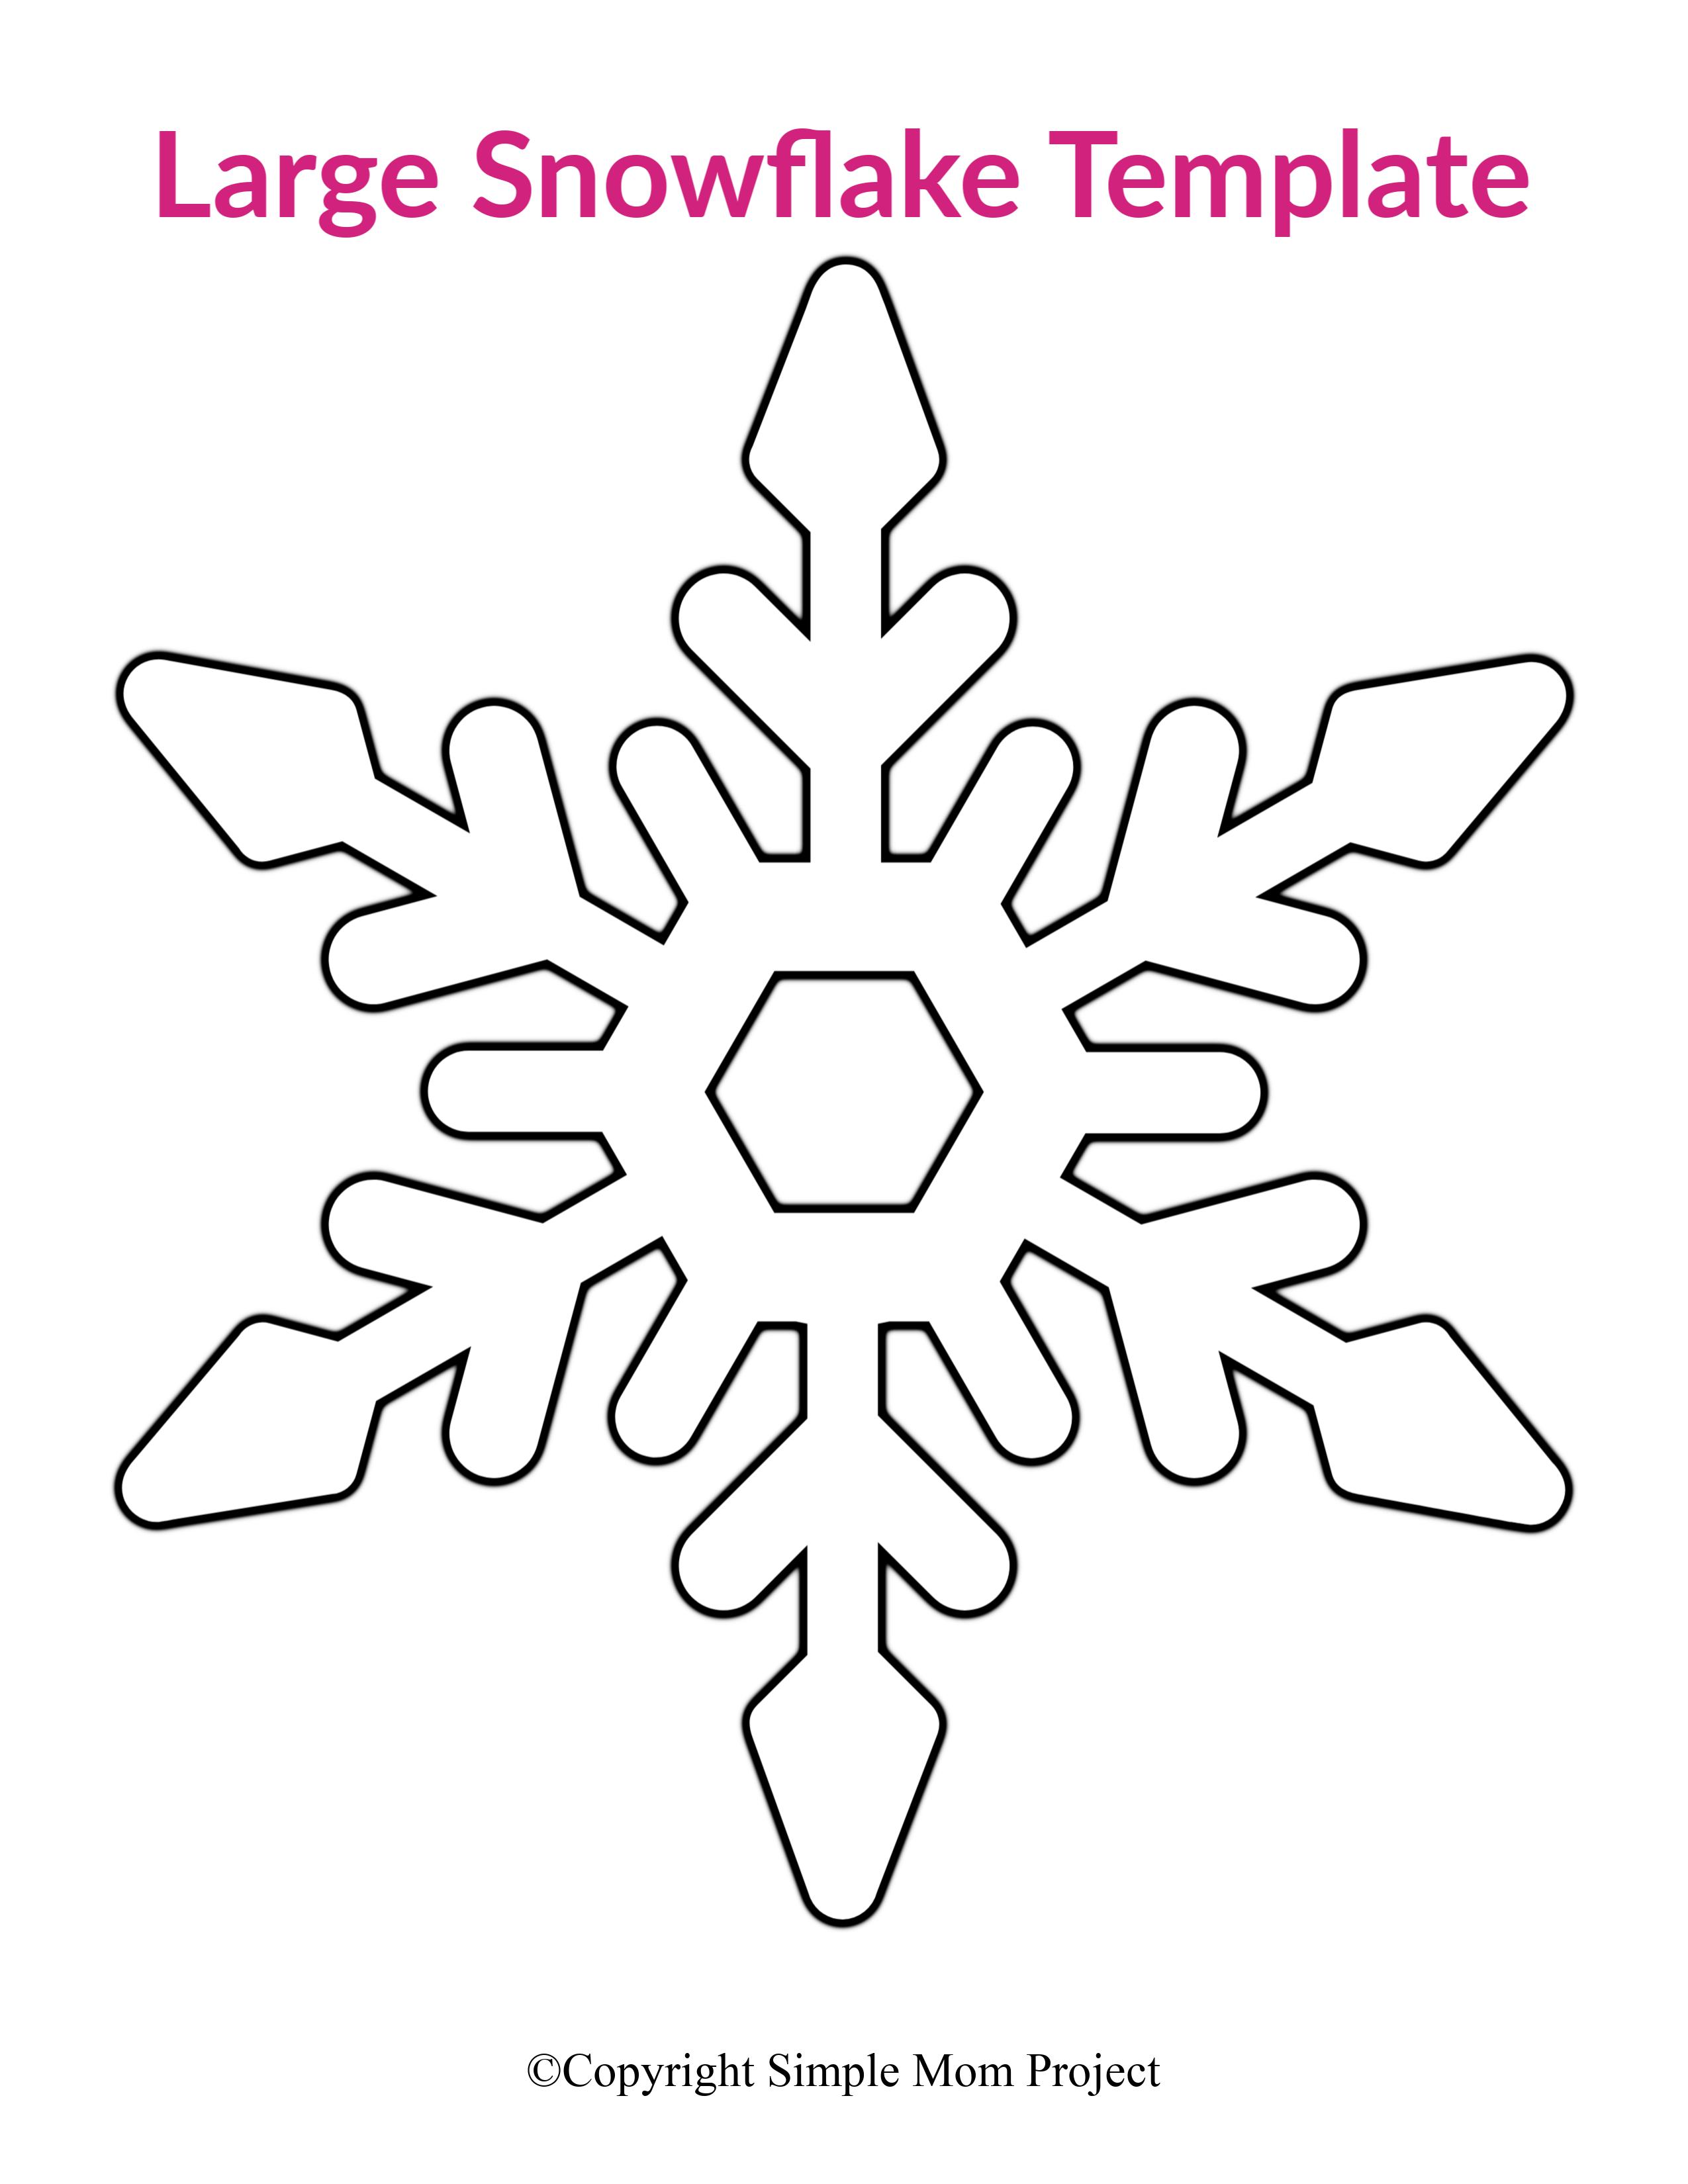 8 Free Printable Large Snowflake Templates